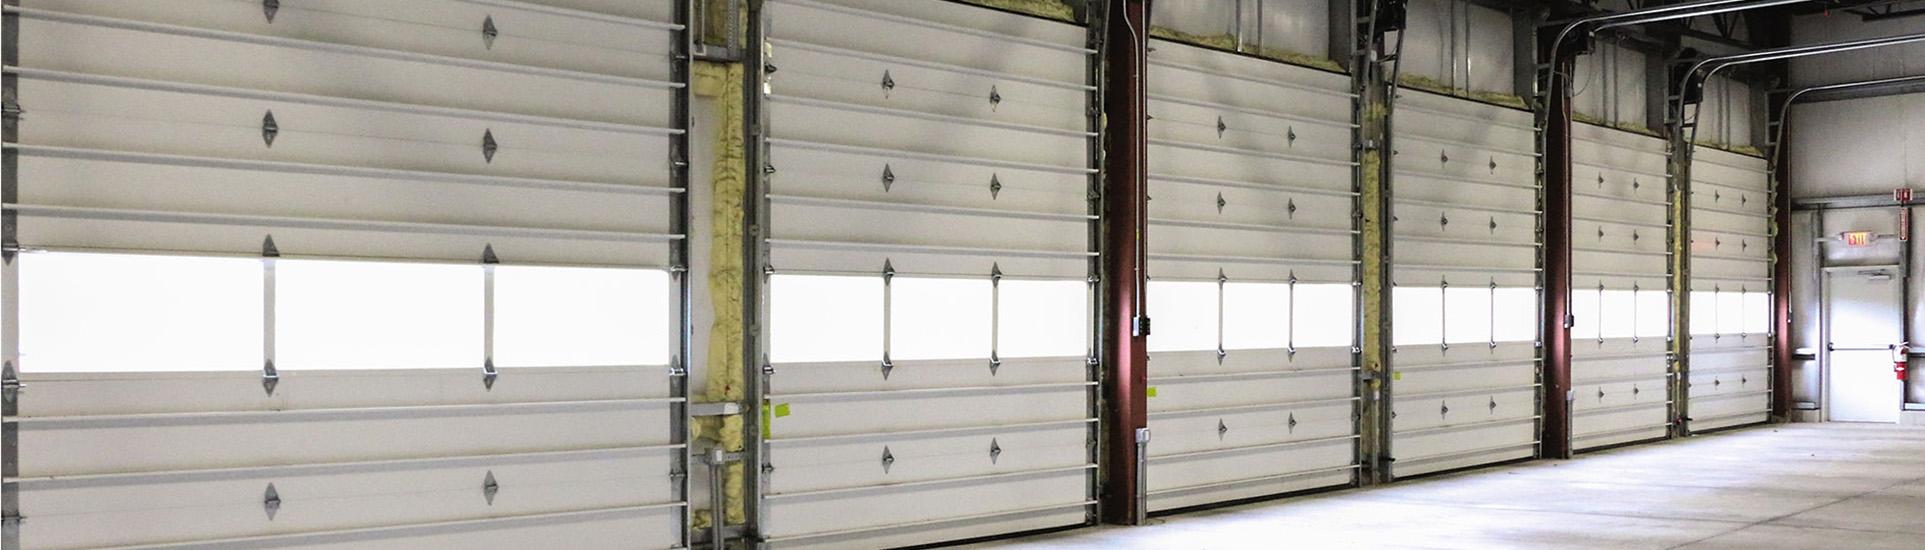 hight resolution of lakeland overhead doors wayne dalton commercial doors